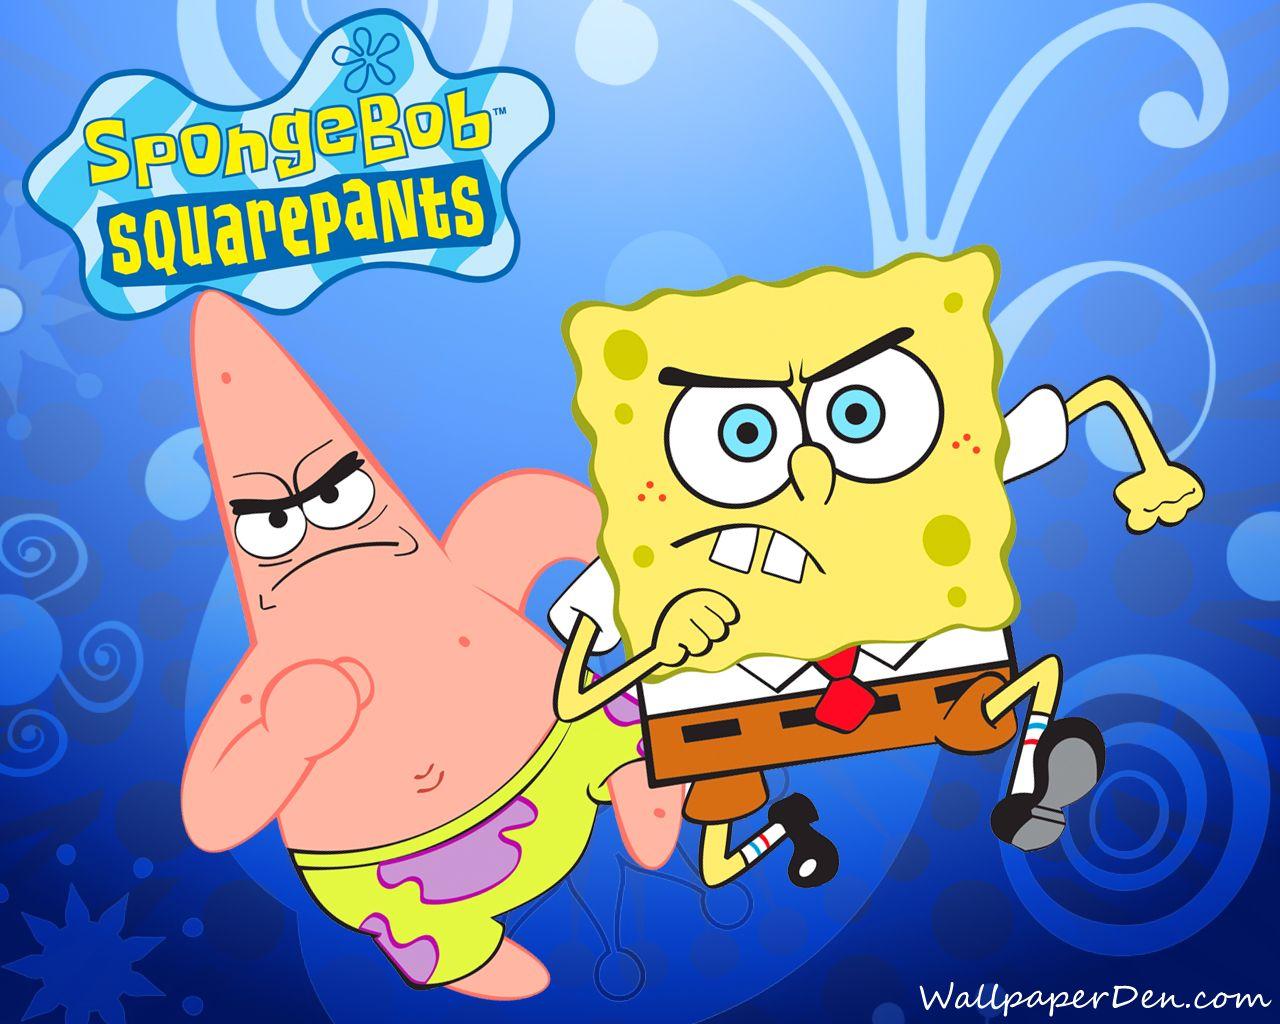 12 best spongebob images on Pinterest  Spongebob squarepants